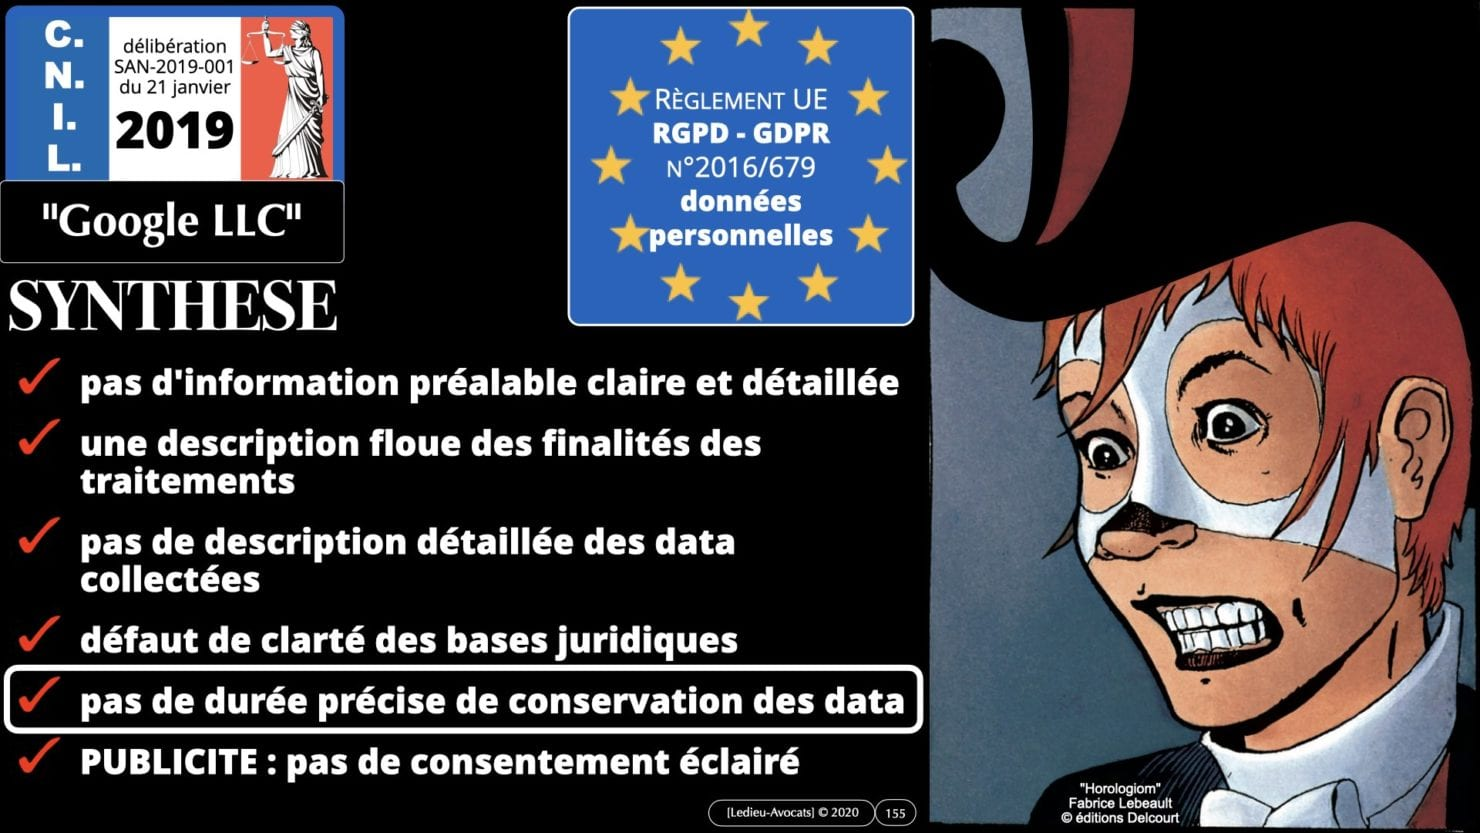 RGPD e-Privacy principes actualité jurisprudence ©Ledieu-Avocats 25-06-2021.155